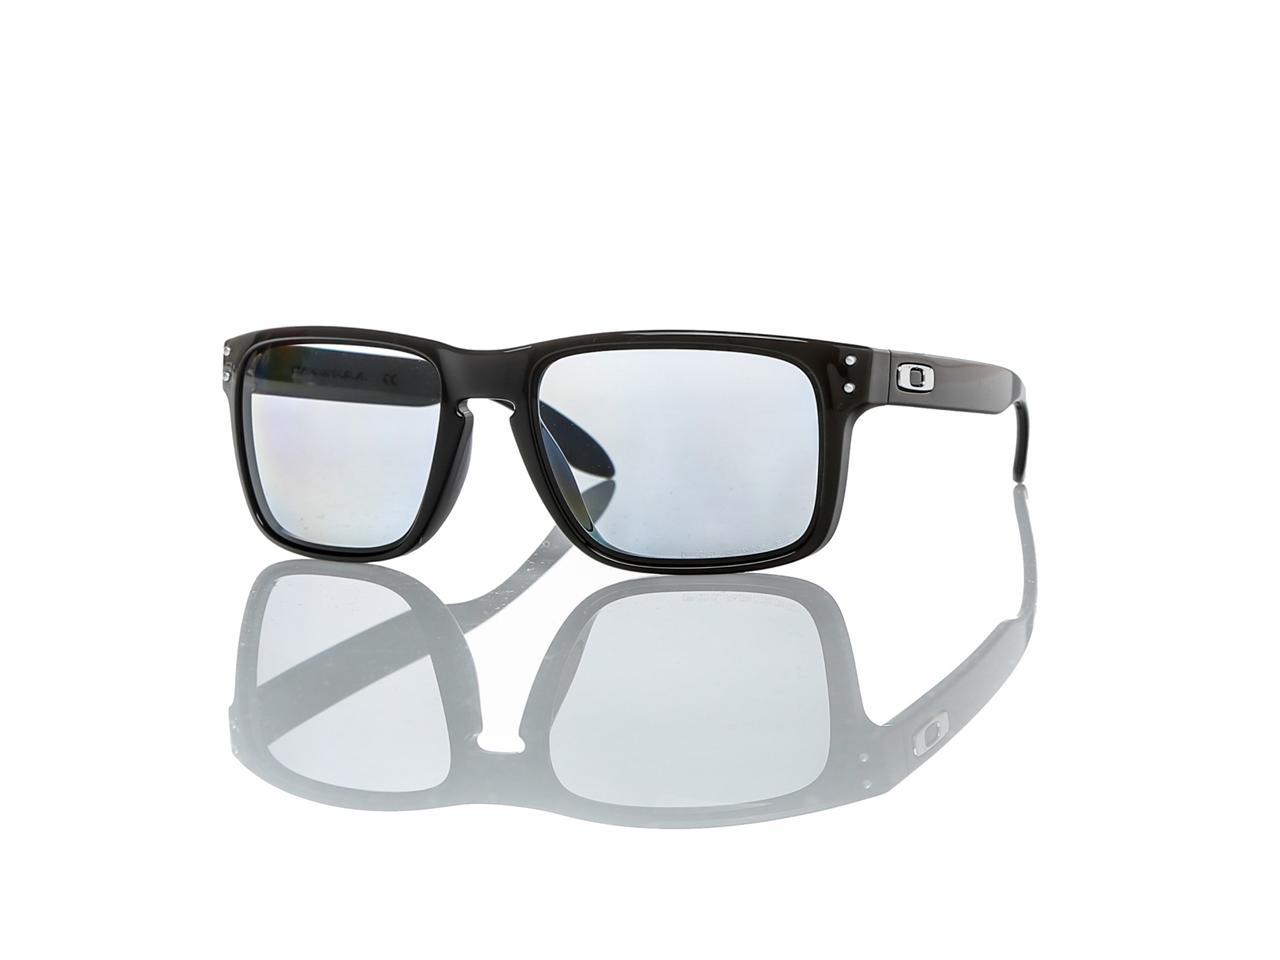 Kreed sunglasses coupon code